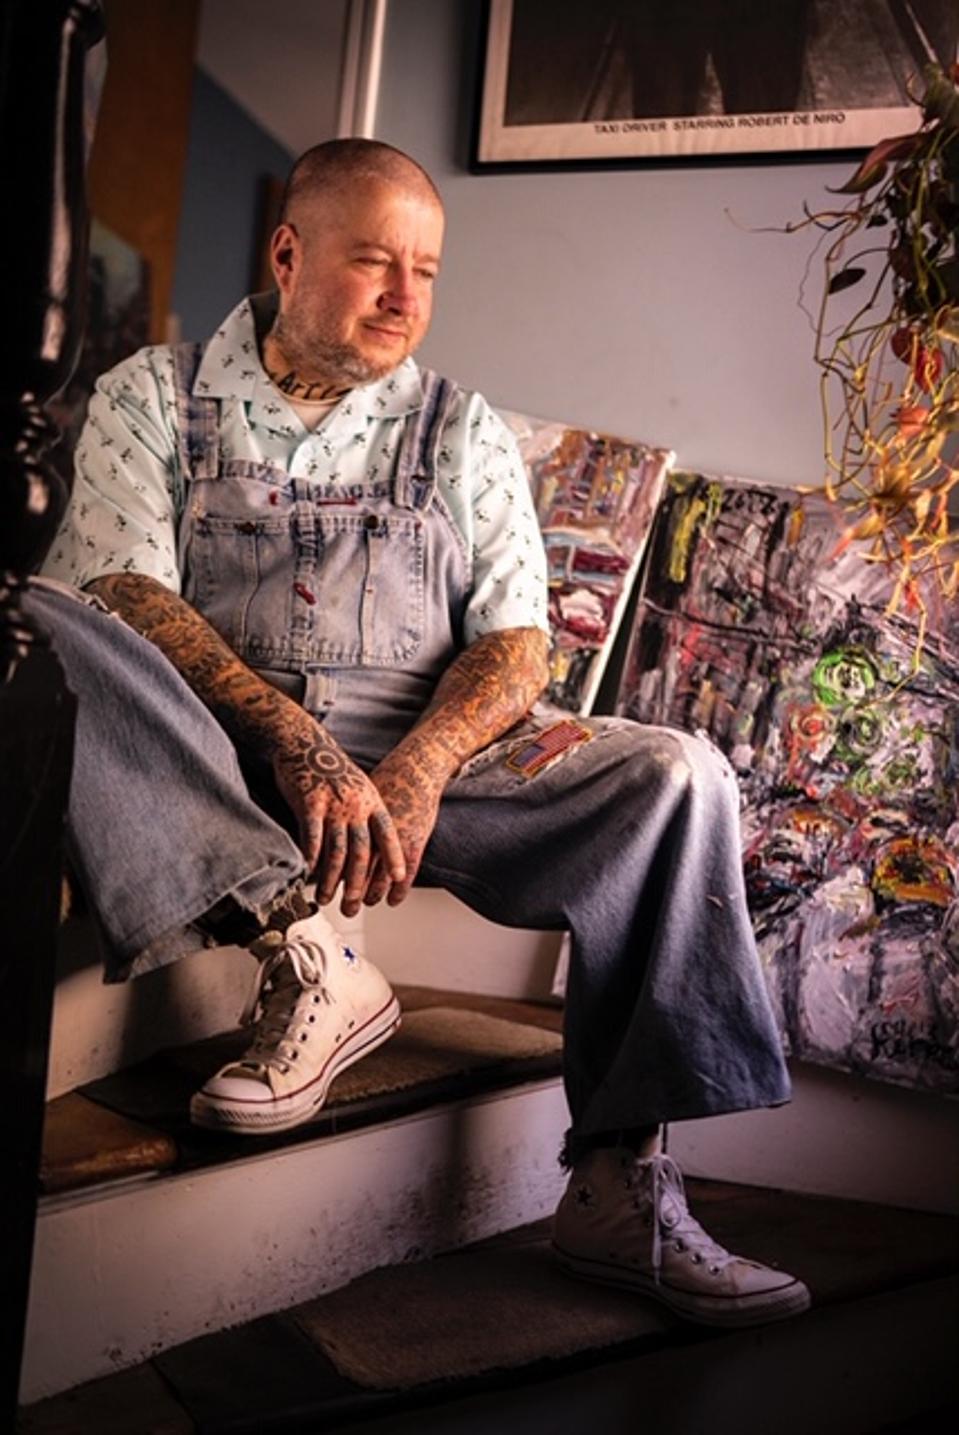 Chris Kappmeier Studio, art, paintings